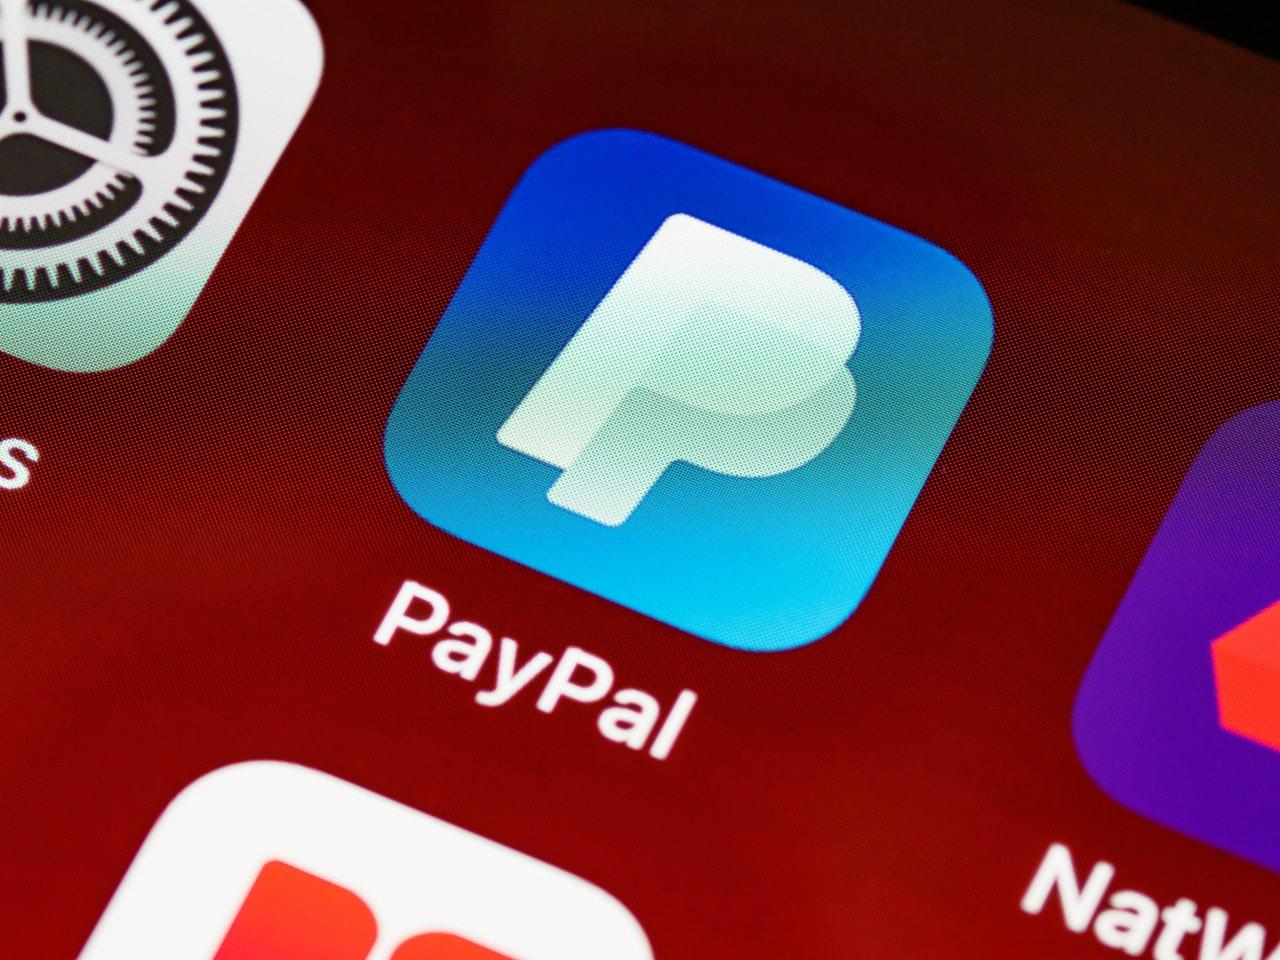 Tarjeta PayPal, ¿Existe en México 2021?